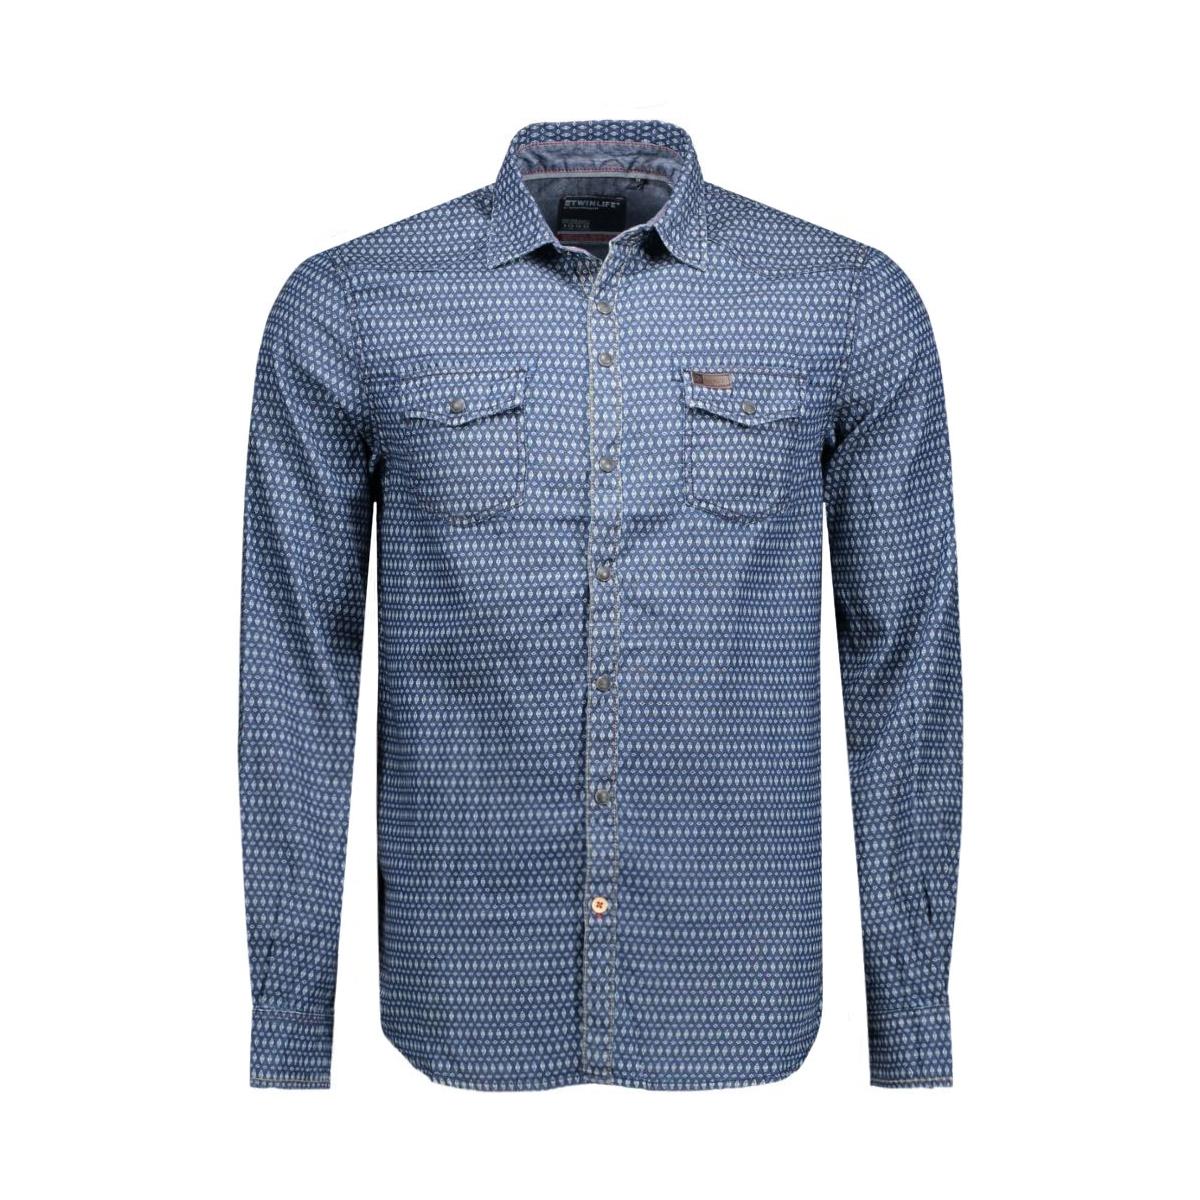 msh651640 twinlife overhemd 6550